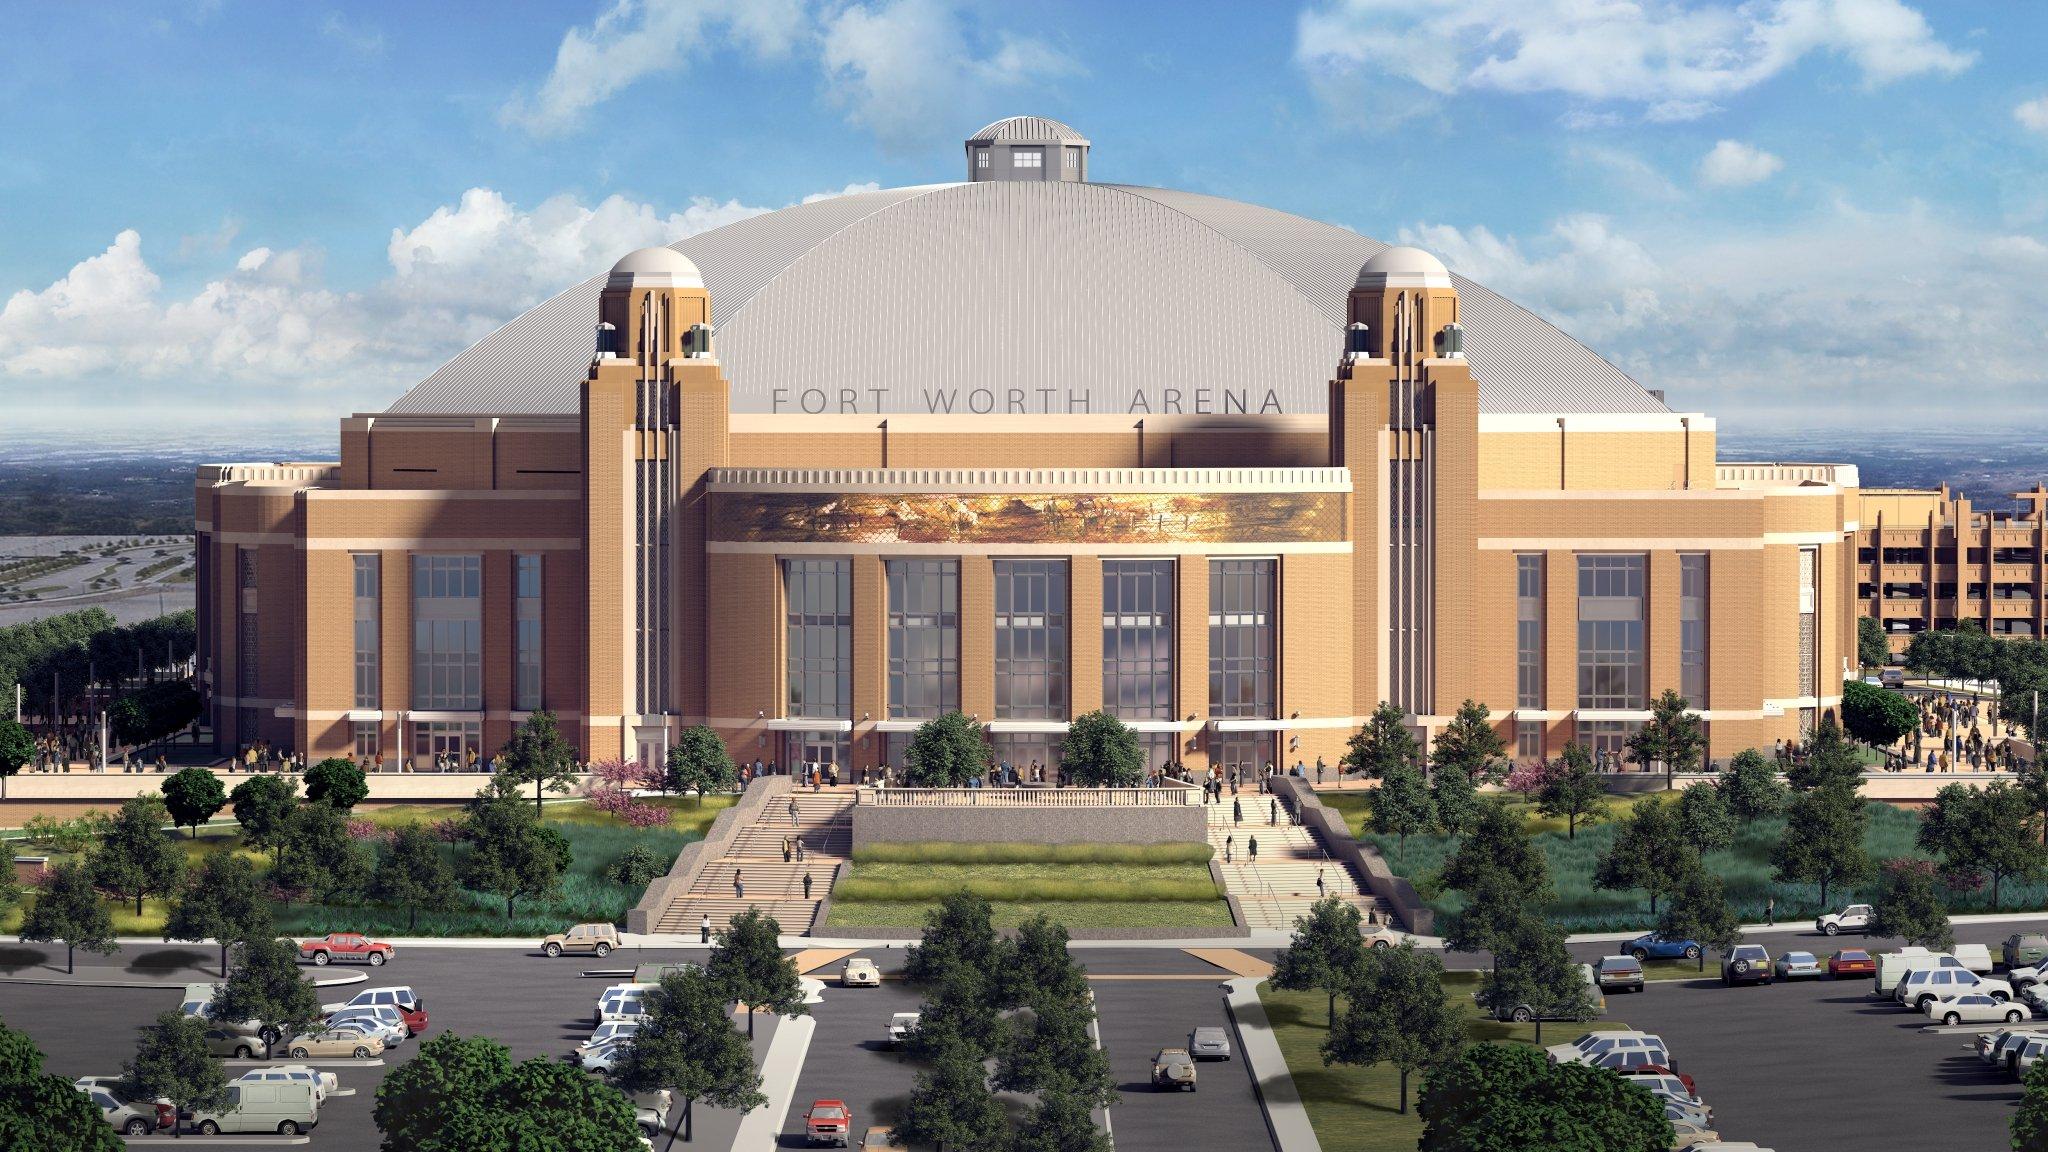 Fort Worth Arena